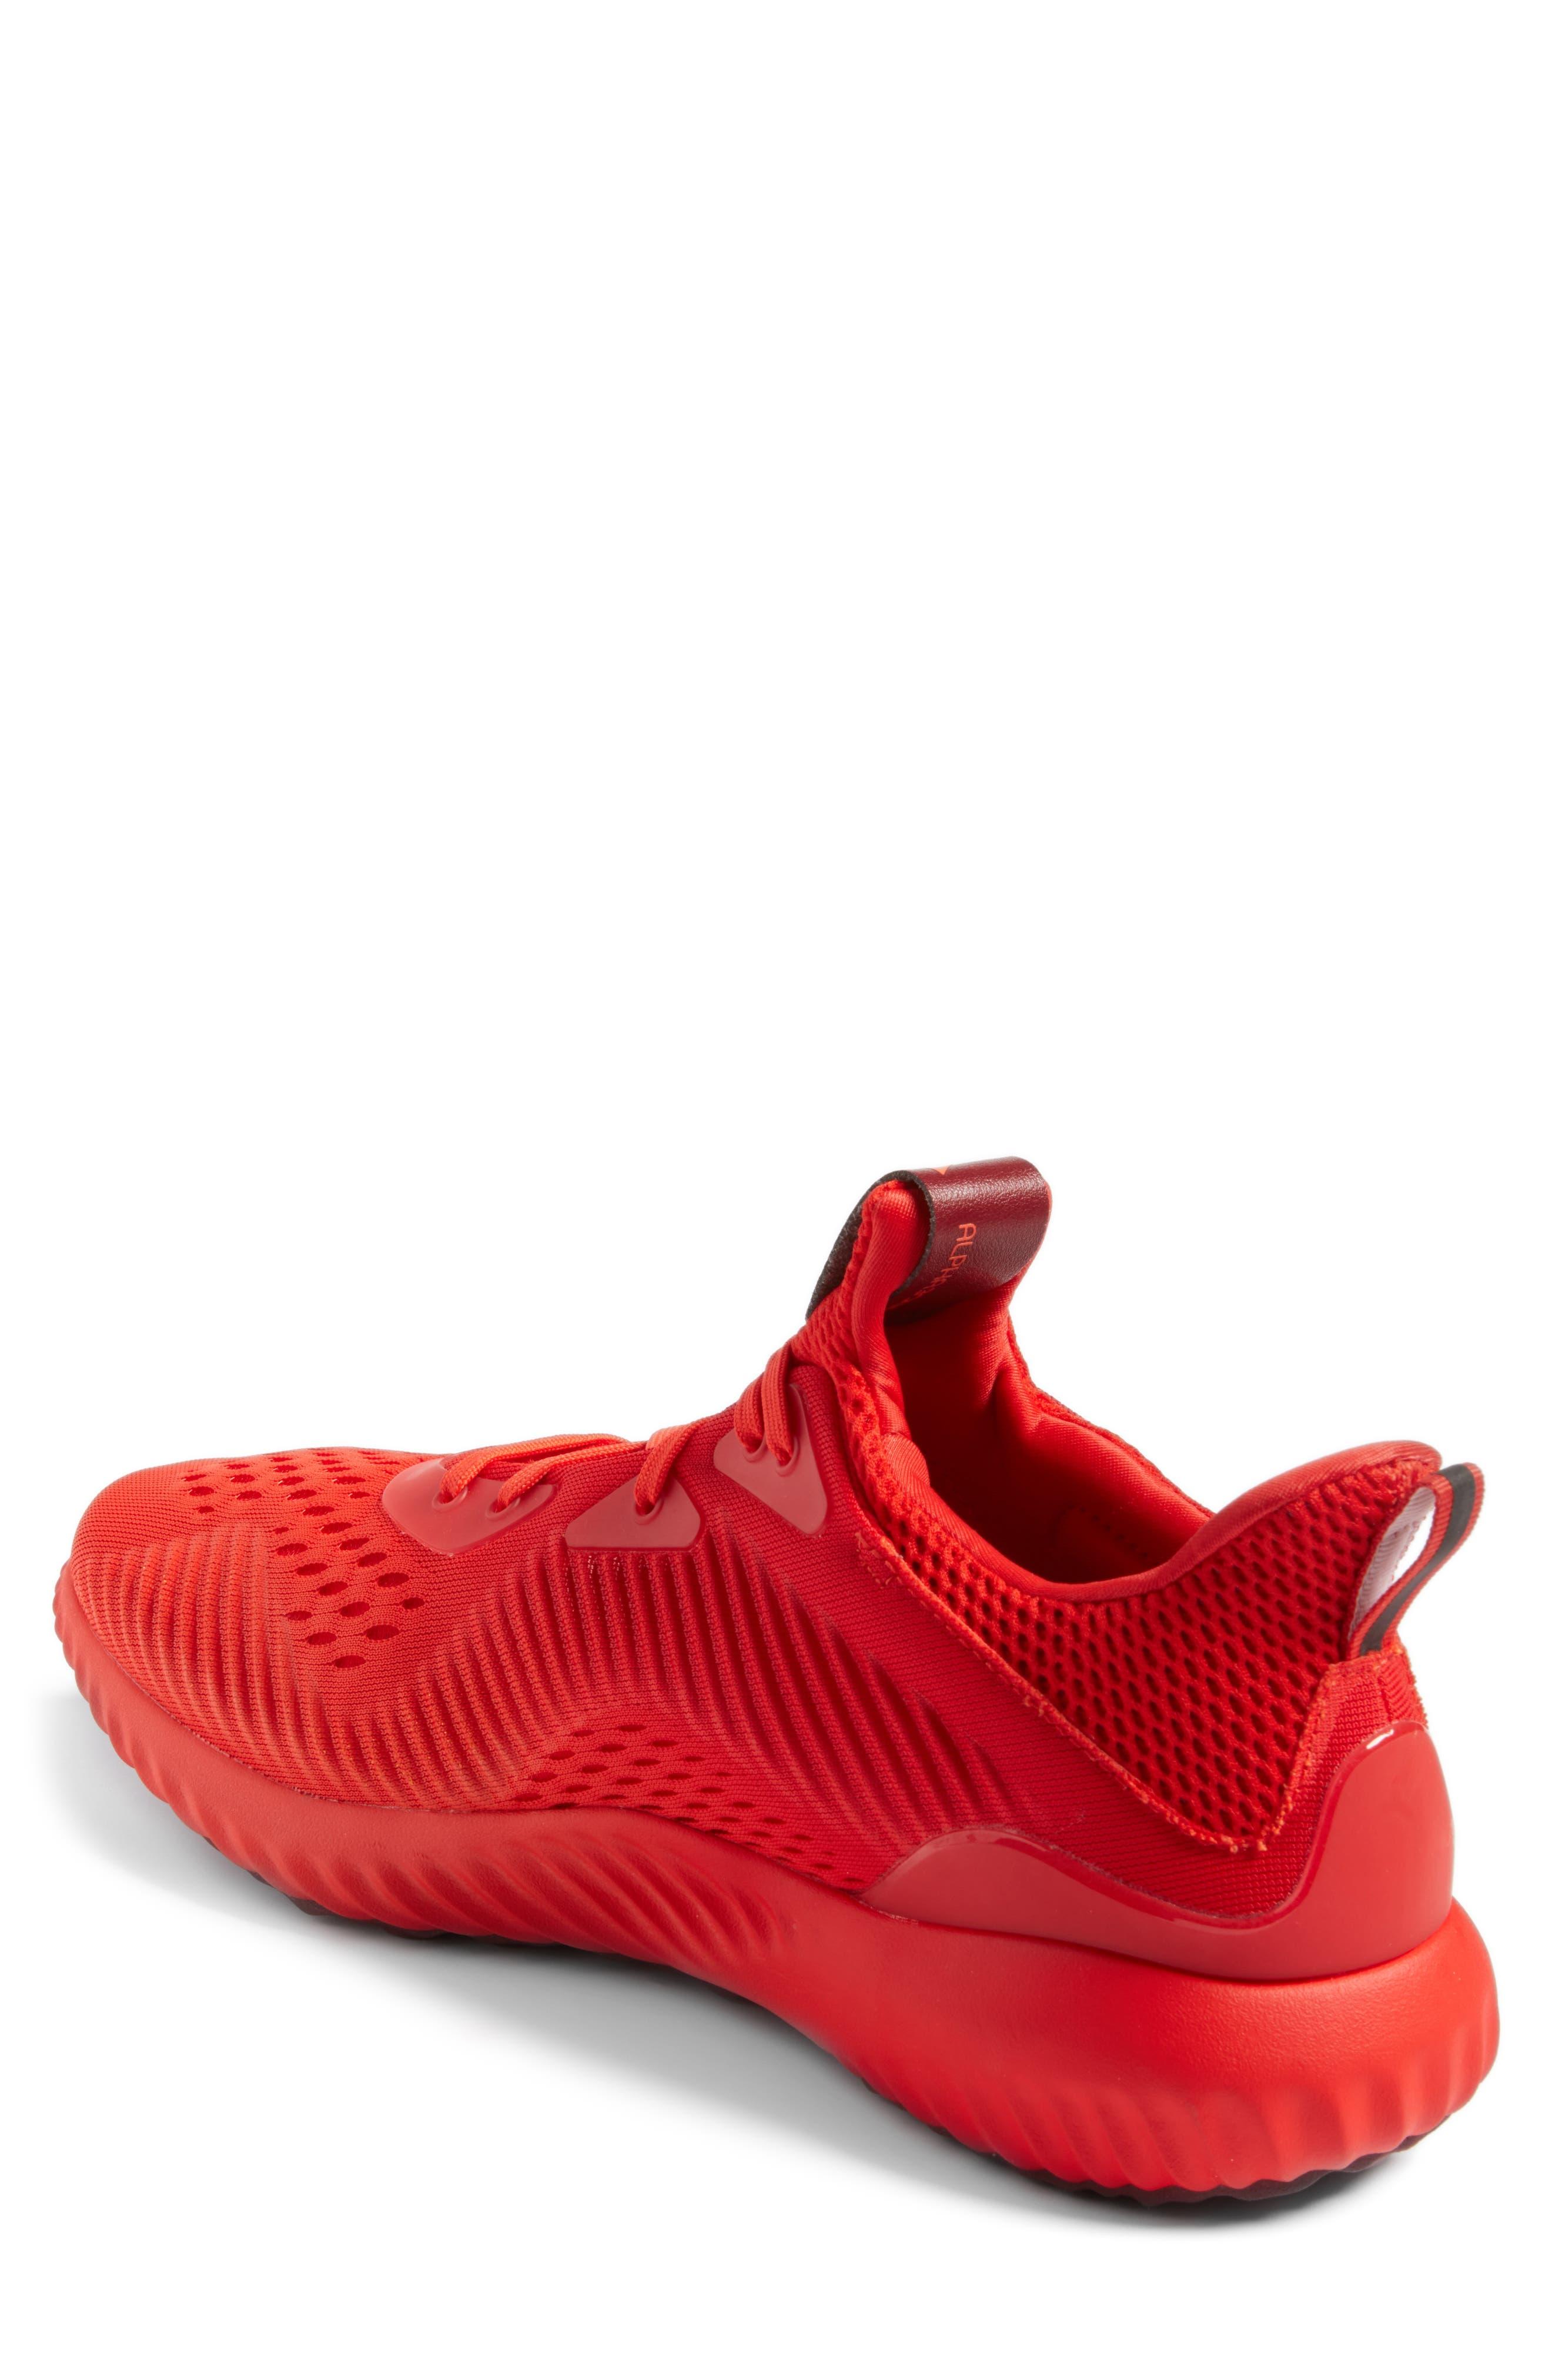 AlphaBounce Running Shoe,                             Alternate thumbnail 2, color,                             600